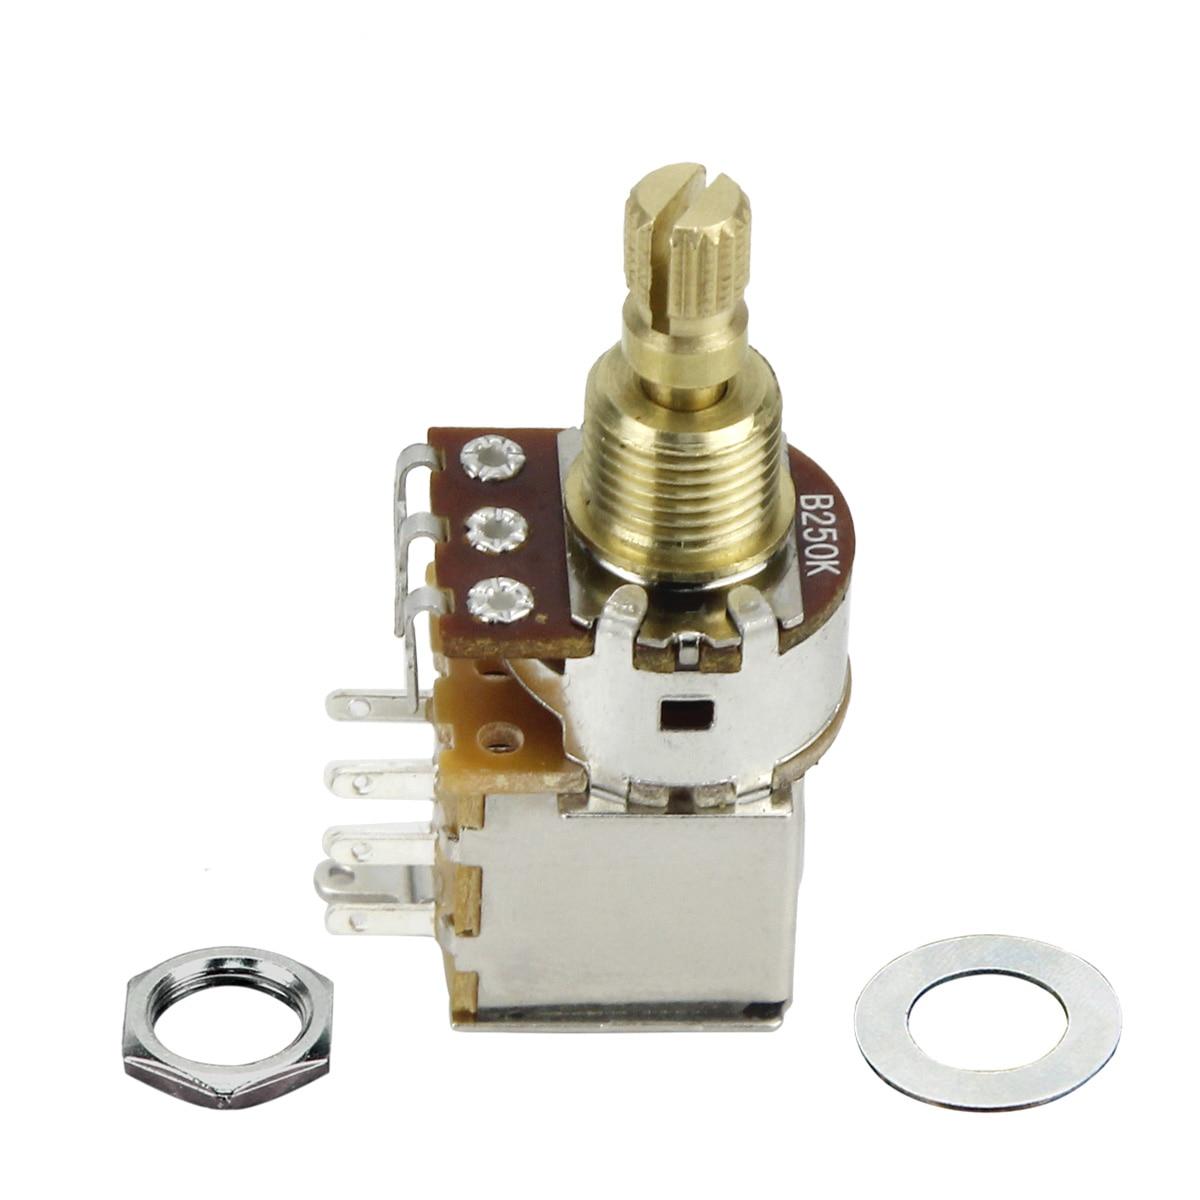 fleor 1pcs b250k guitar potentiometer push push potentiometer dpdt switch linear tape short split shaft don t pull anymore  [ 1200 x 1200 Pixel ]